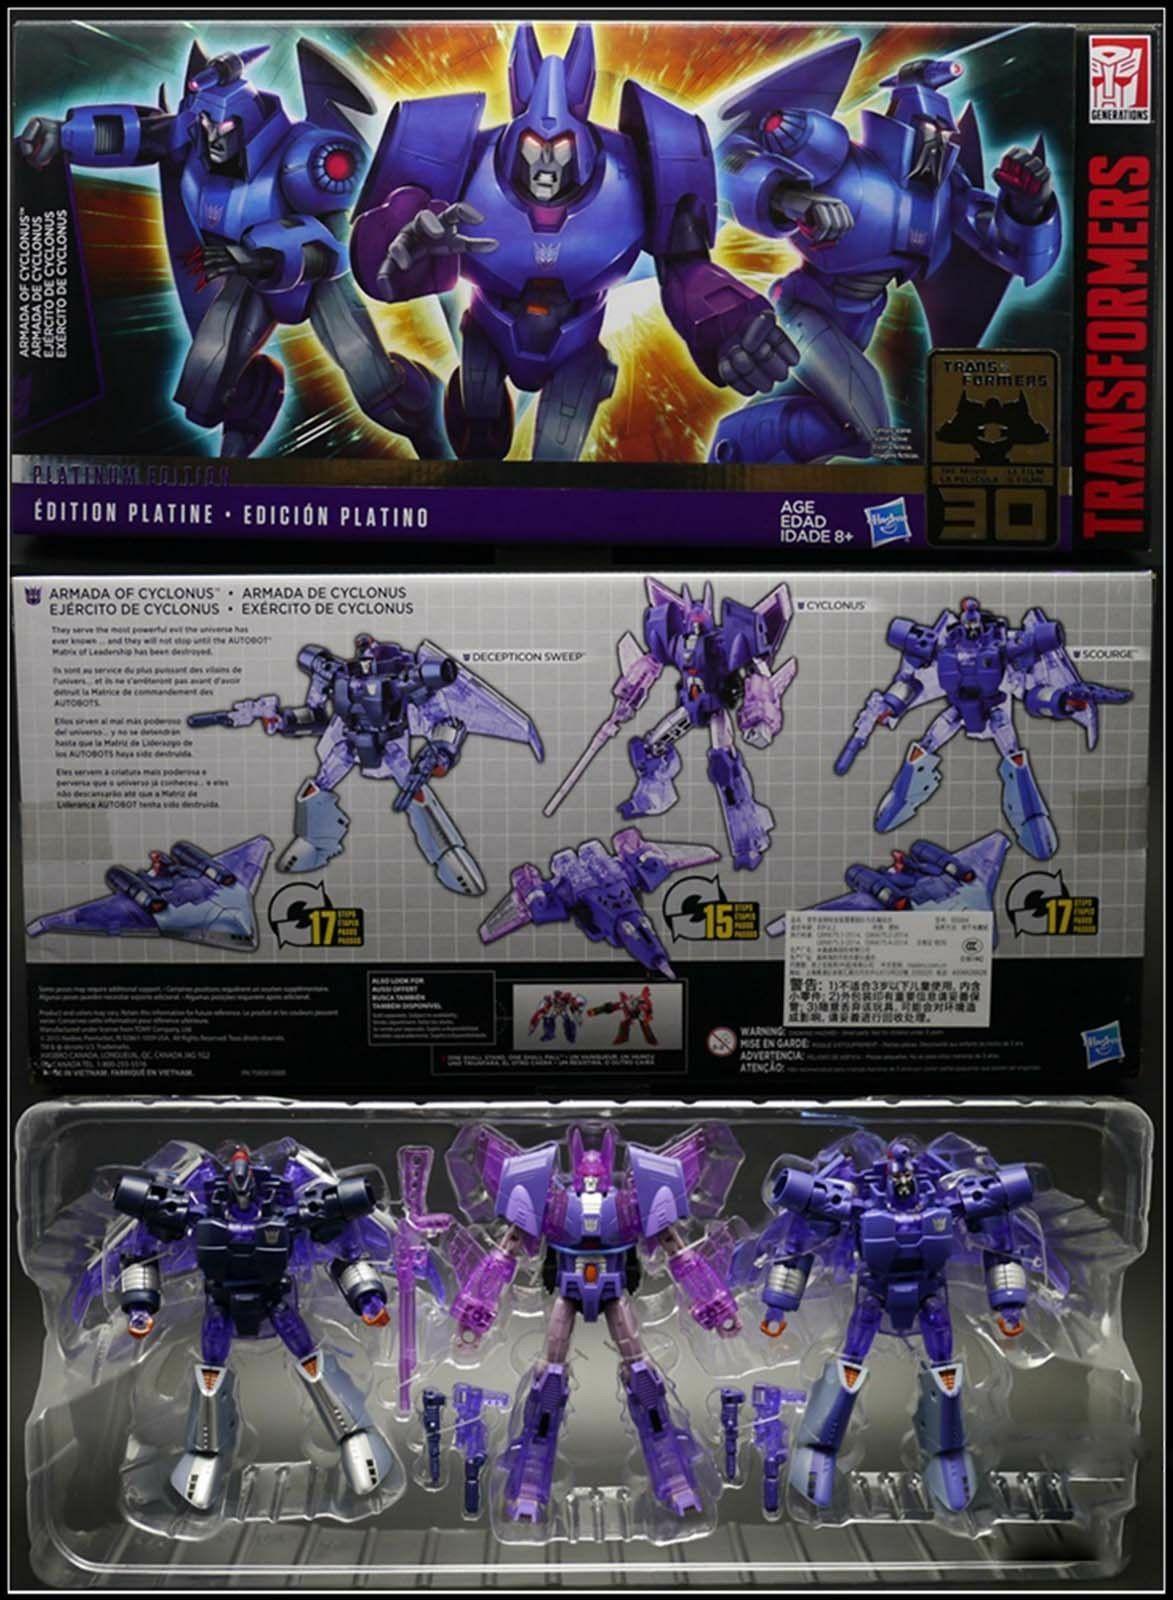 Transformers Cyclonus & Scourge & Redshirt £26.95 @ Kapow Toys